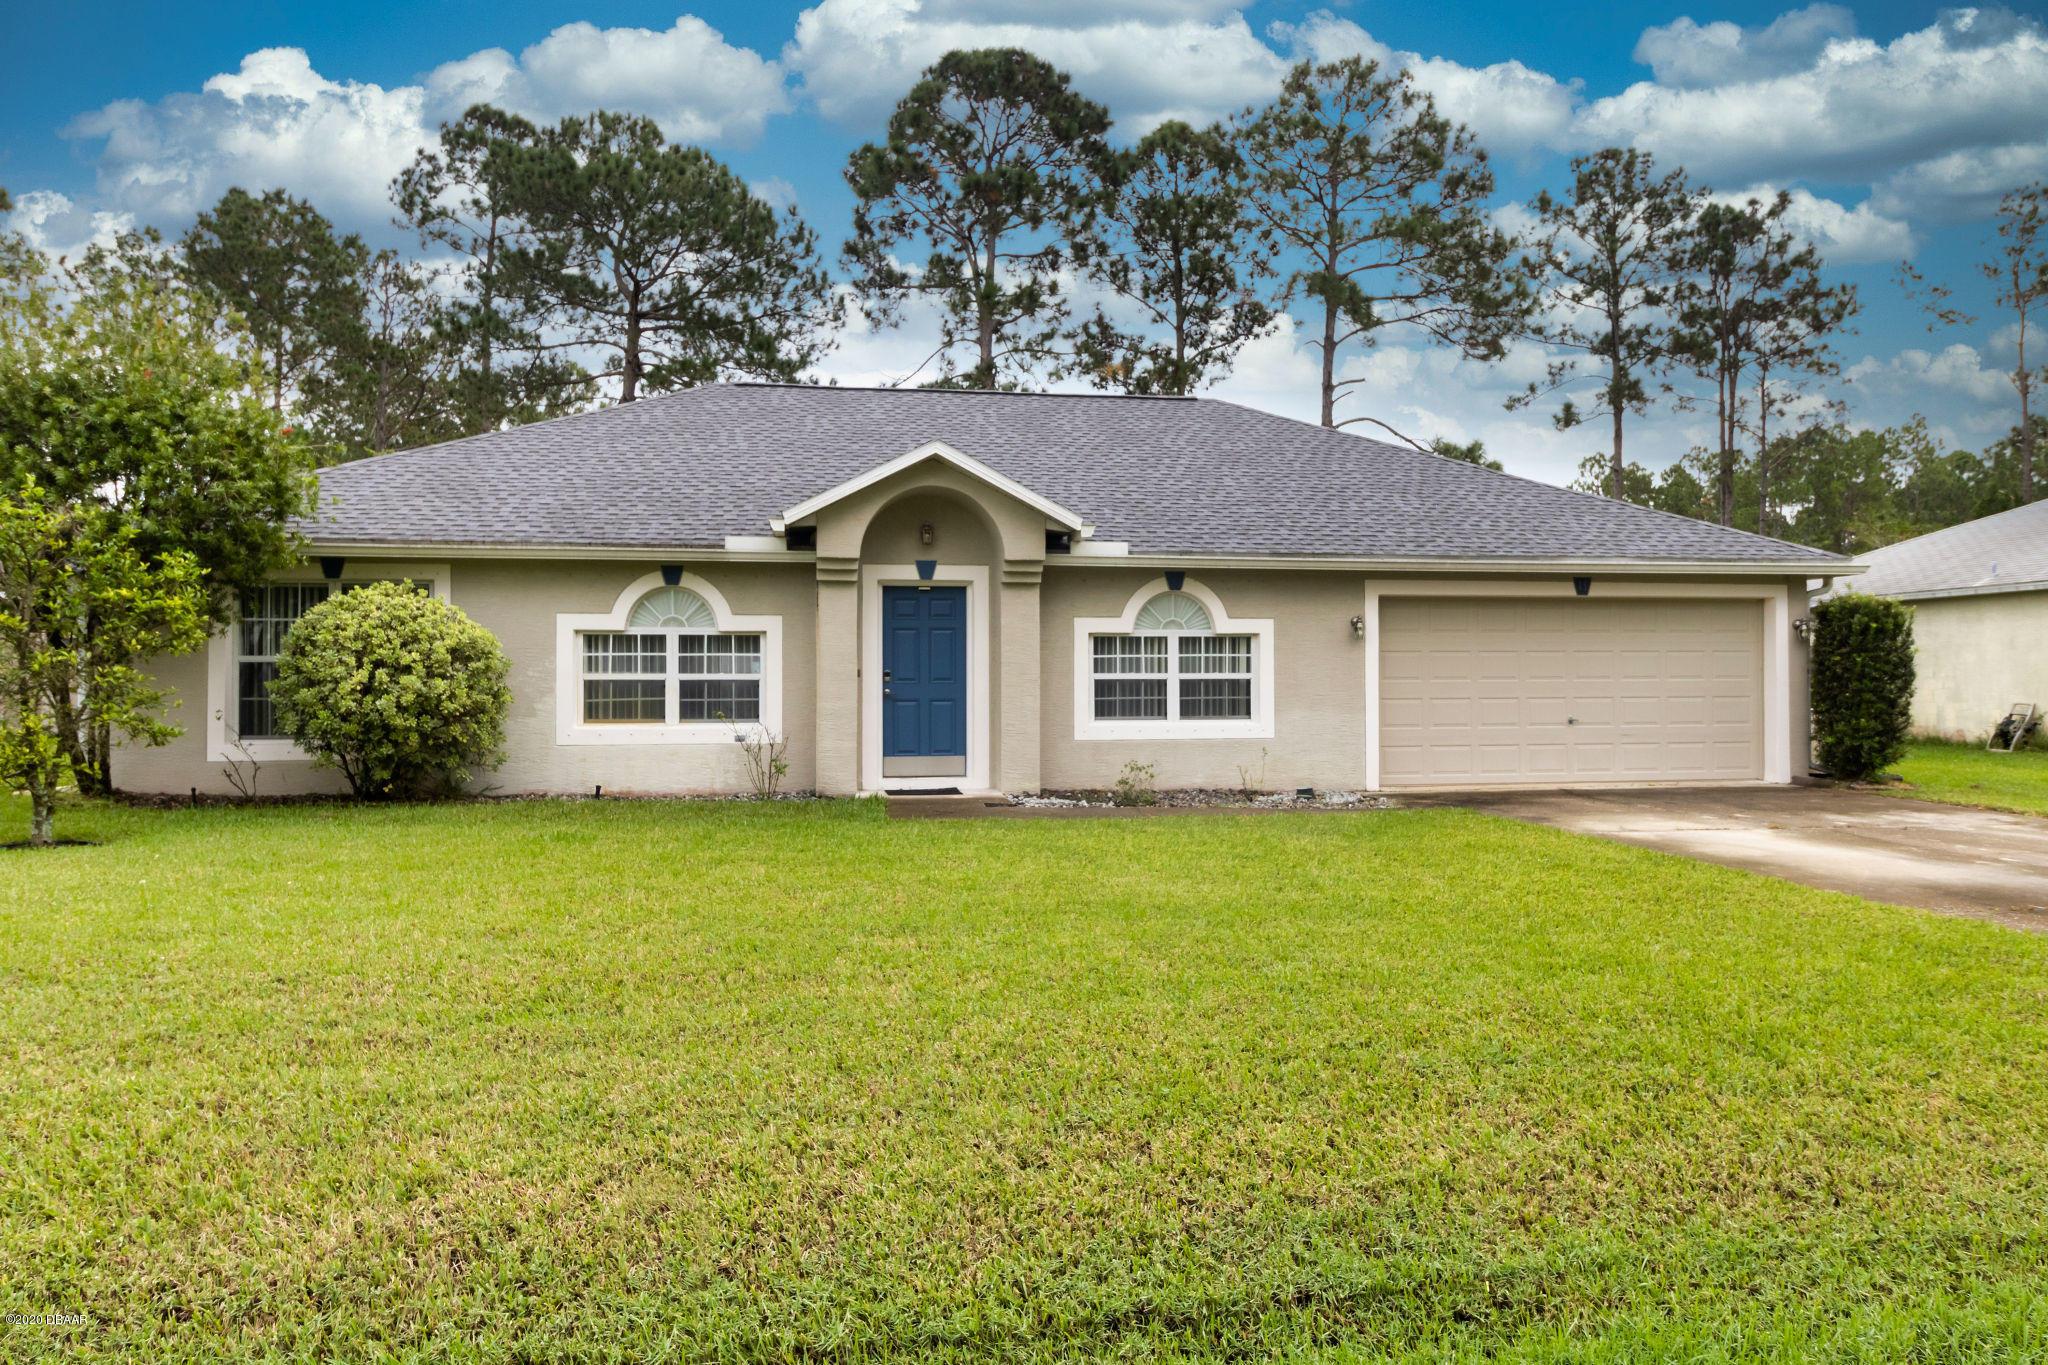 Photo of 11 Renmont Place, Palm Coast, FL 32164